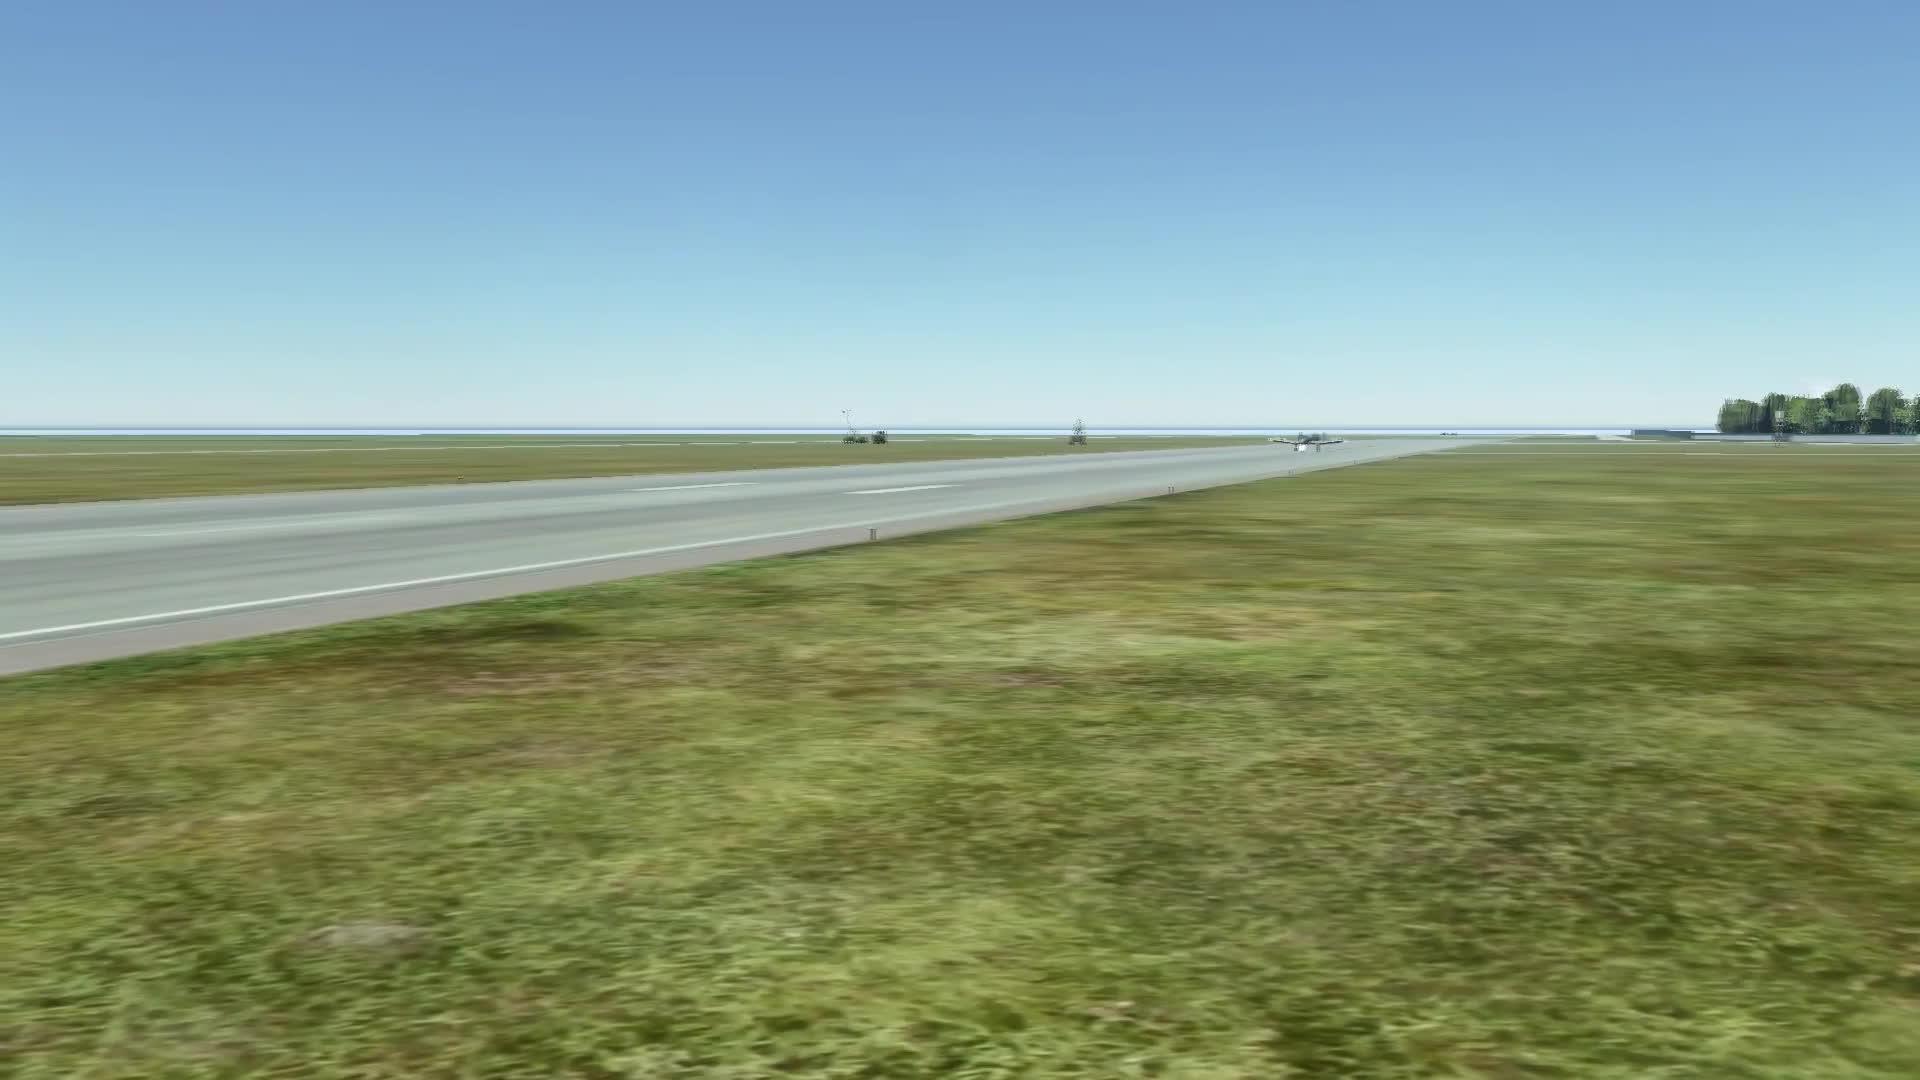 hoggit, DCS A-10C: When brakes aren't enough GIFs